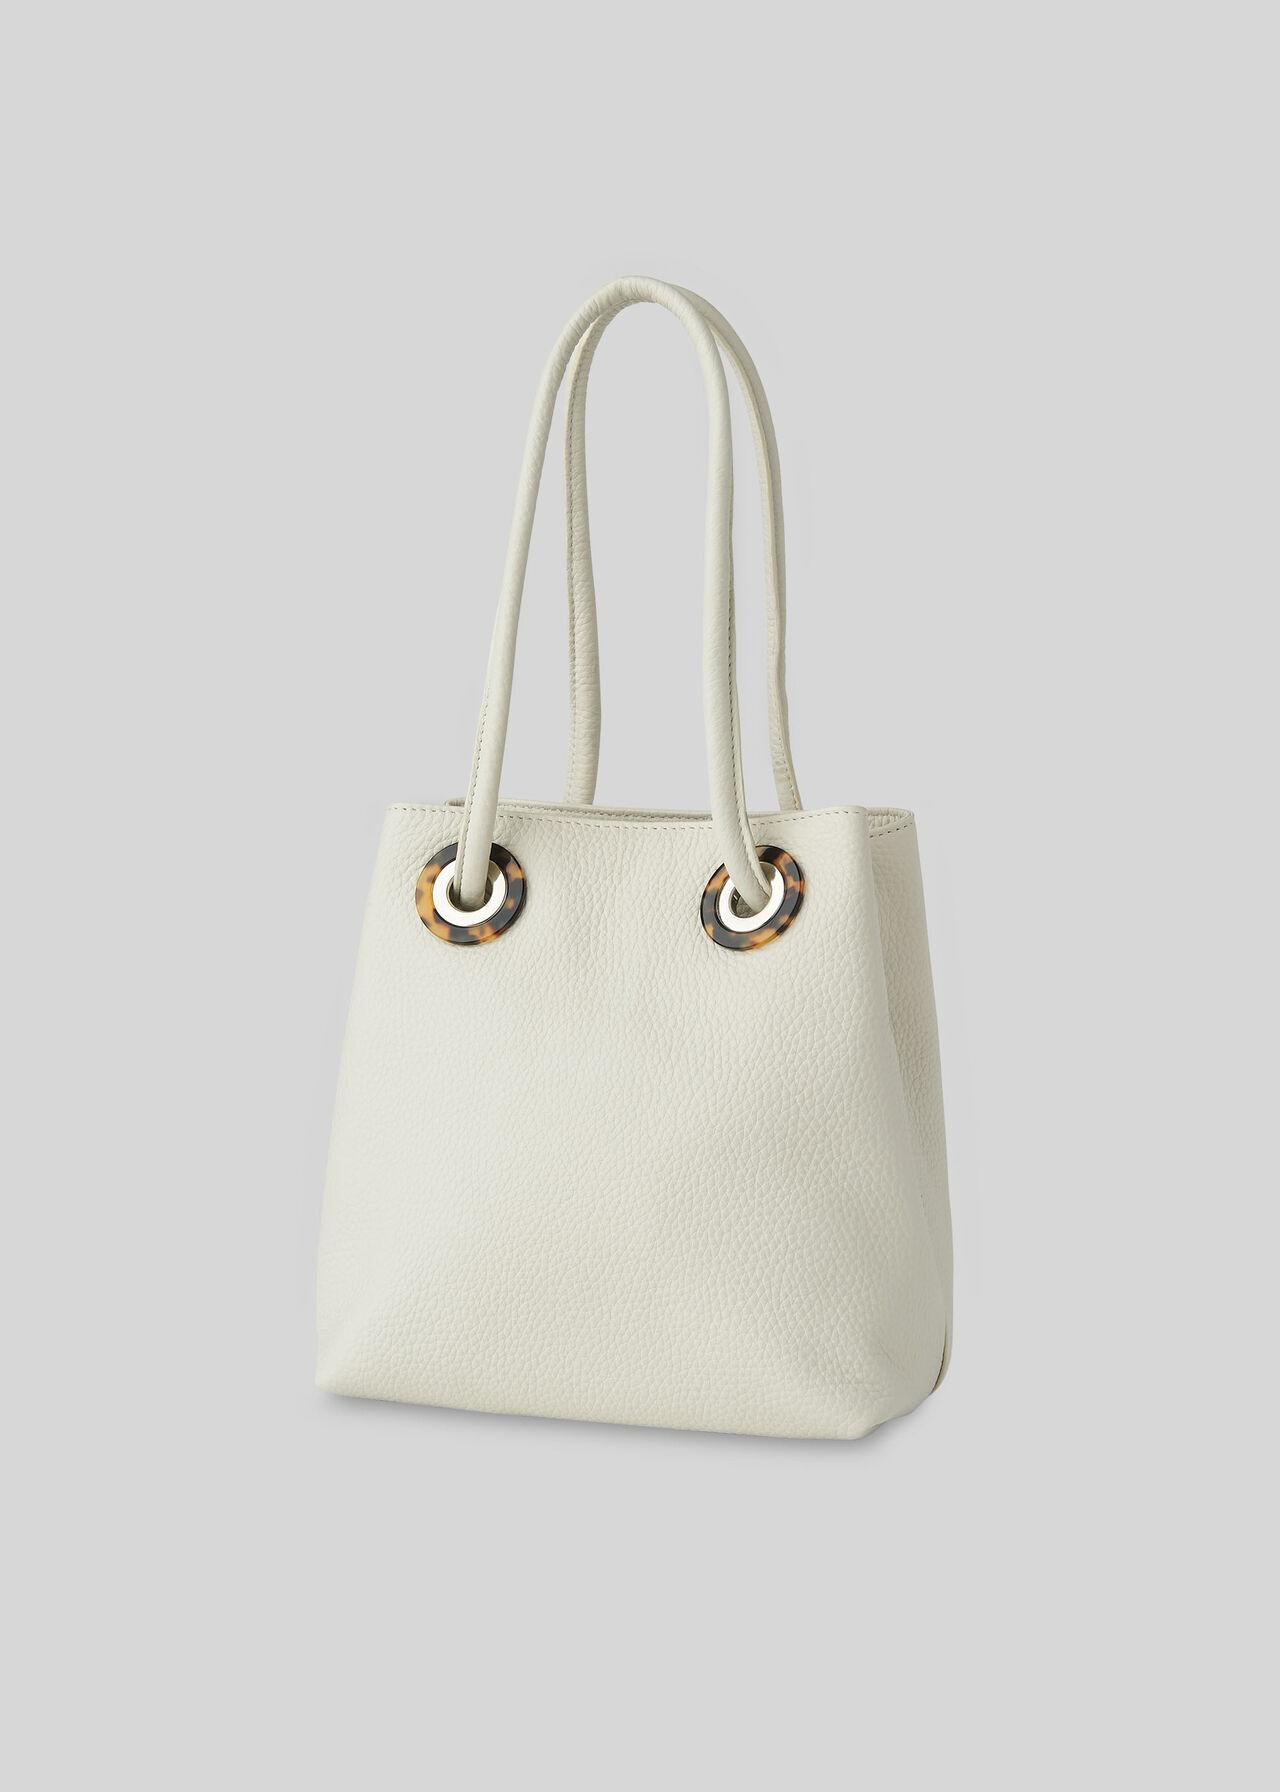 Mabel Tort Eyelet Bag